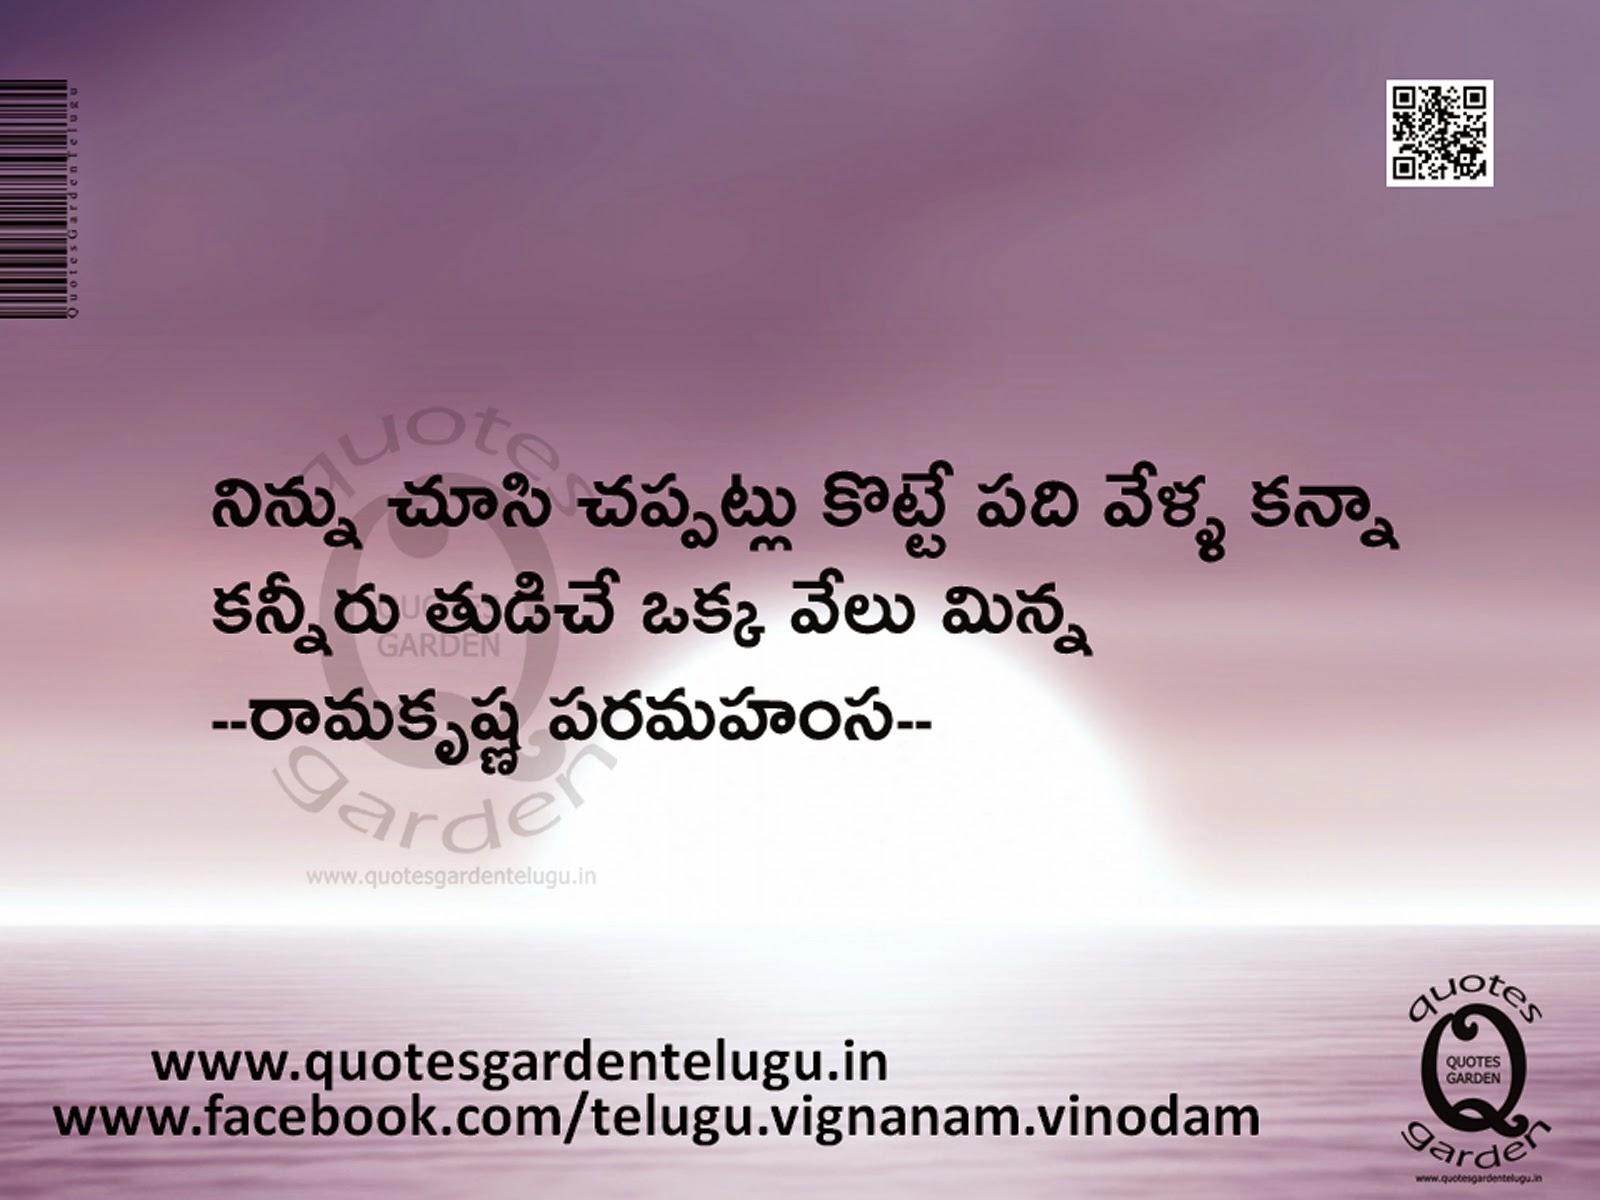 Sad Love Wallpapers Hd In Hindi Best Telugu Quotes Ramakrishna Paramahamsa With Images